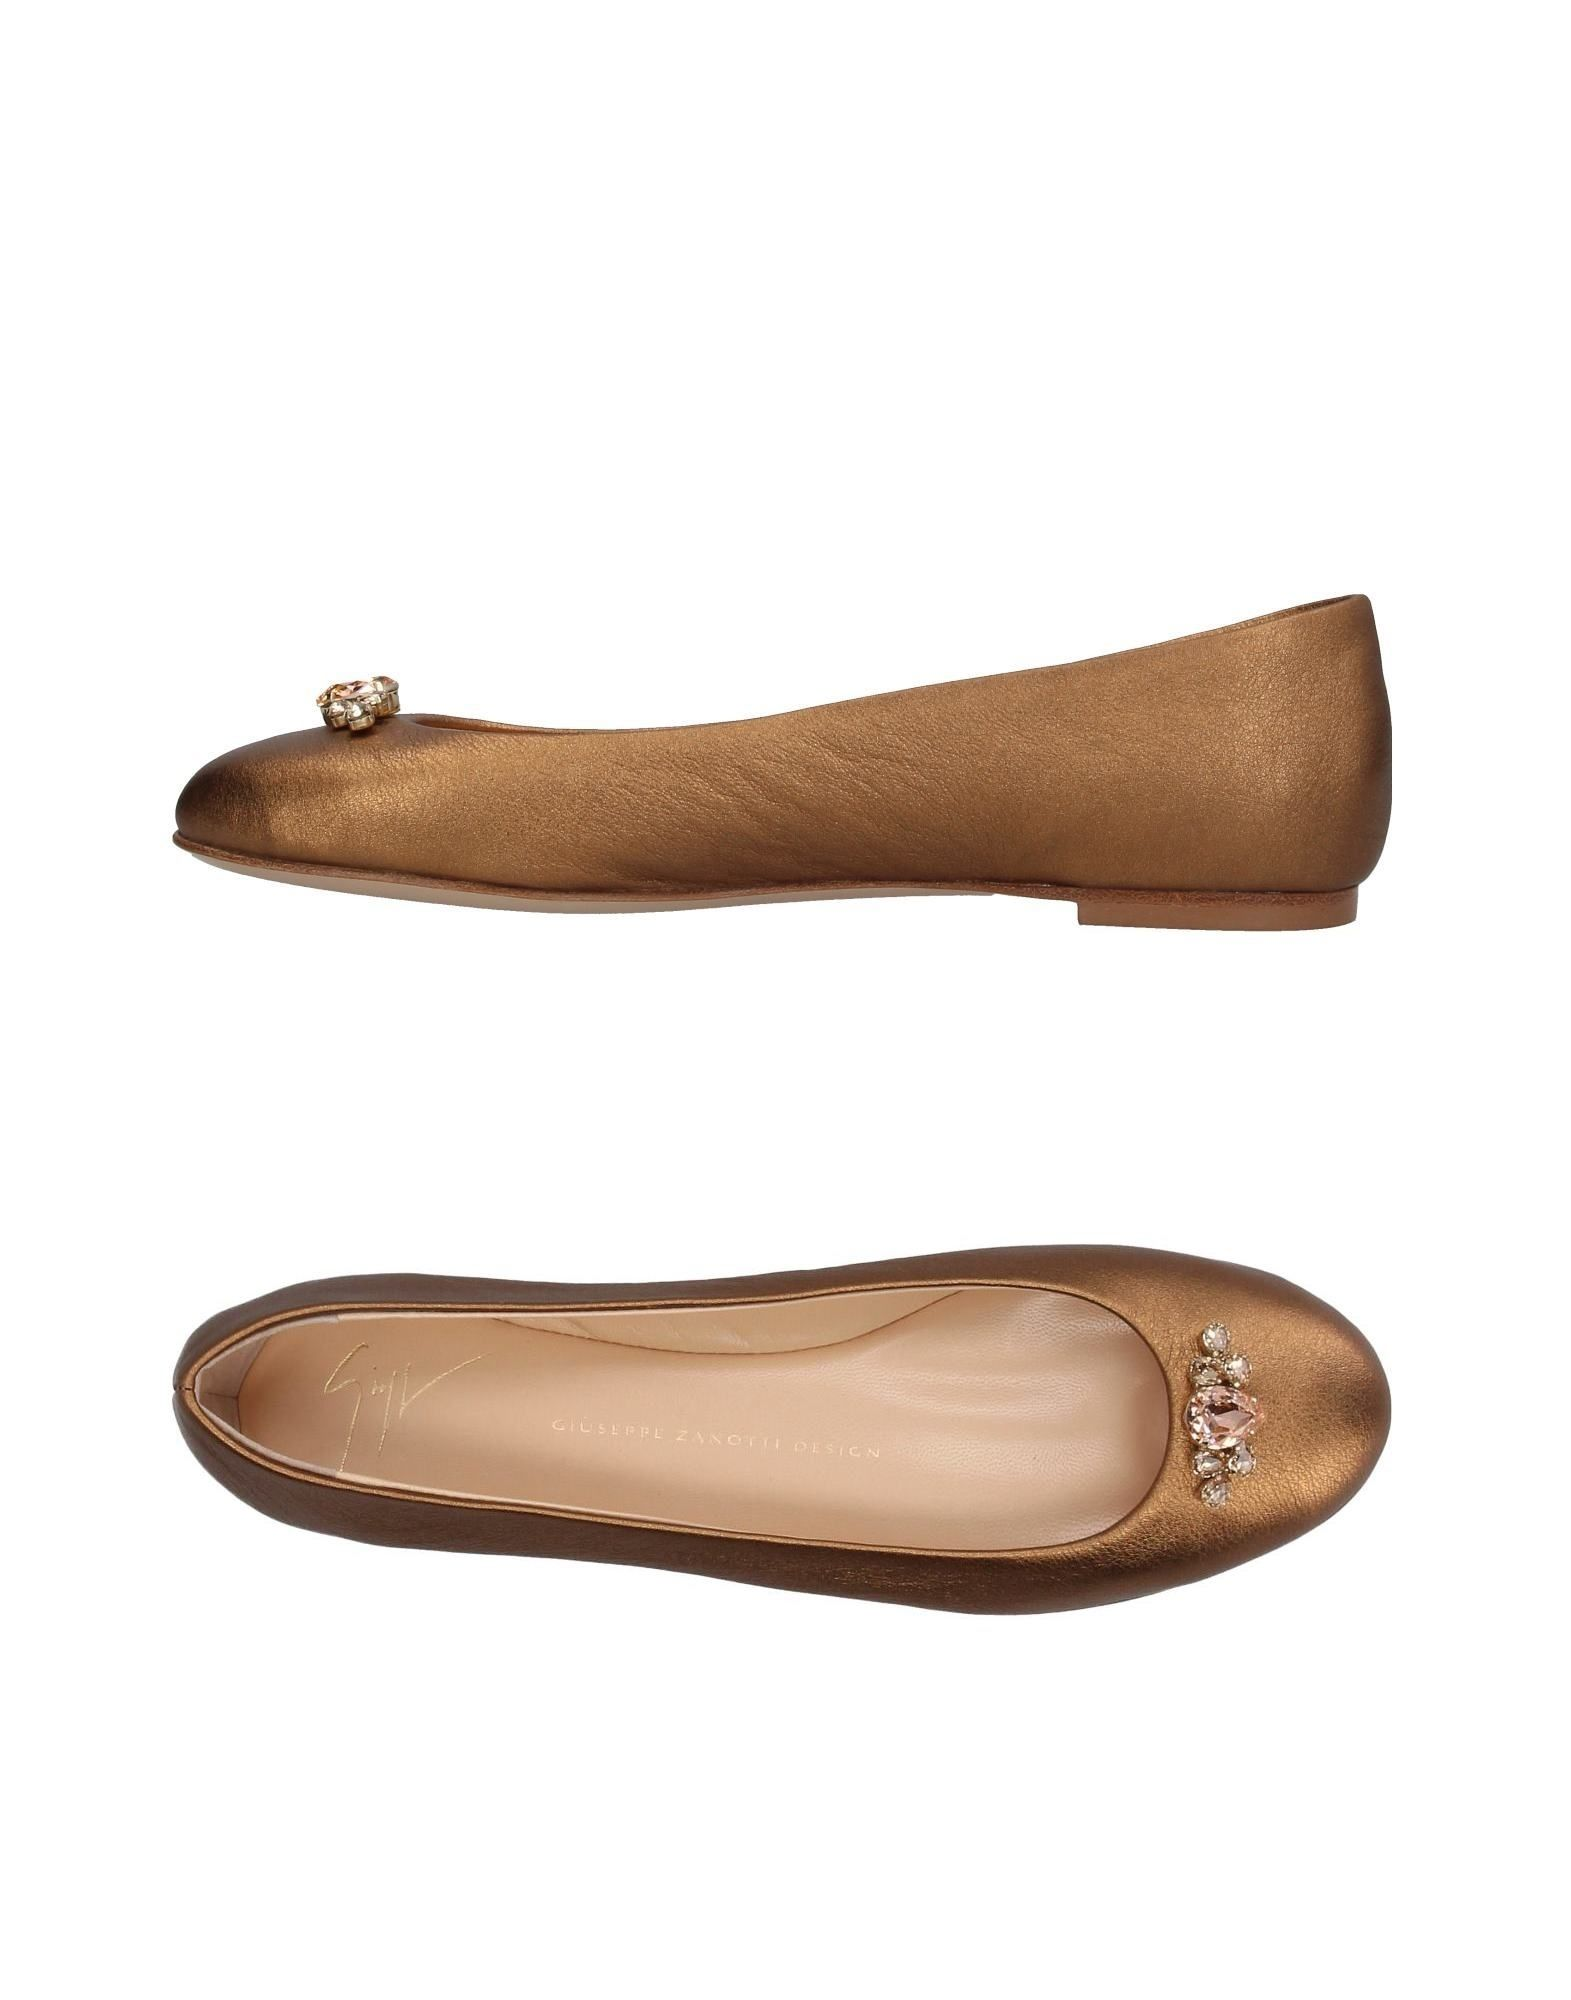 Rabatt Schuhe Giuseppe Zanotti Ballerinas Damen  11394881GH